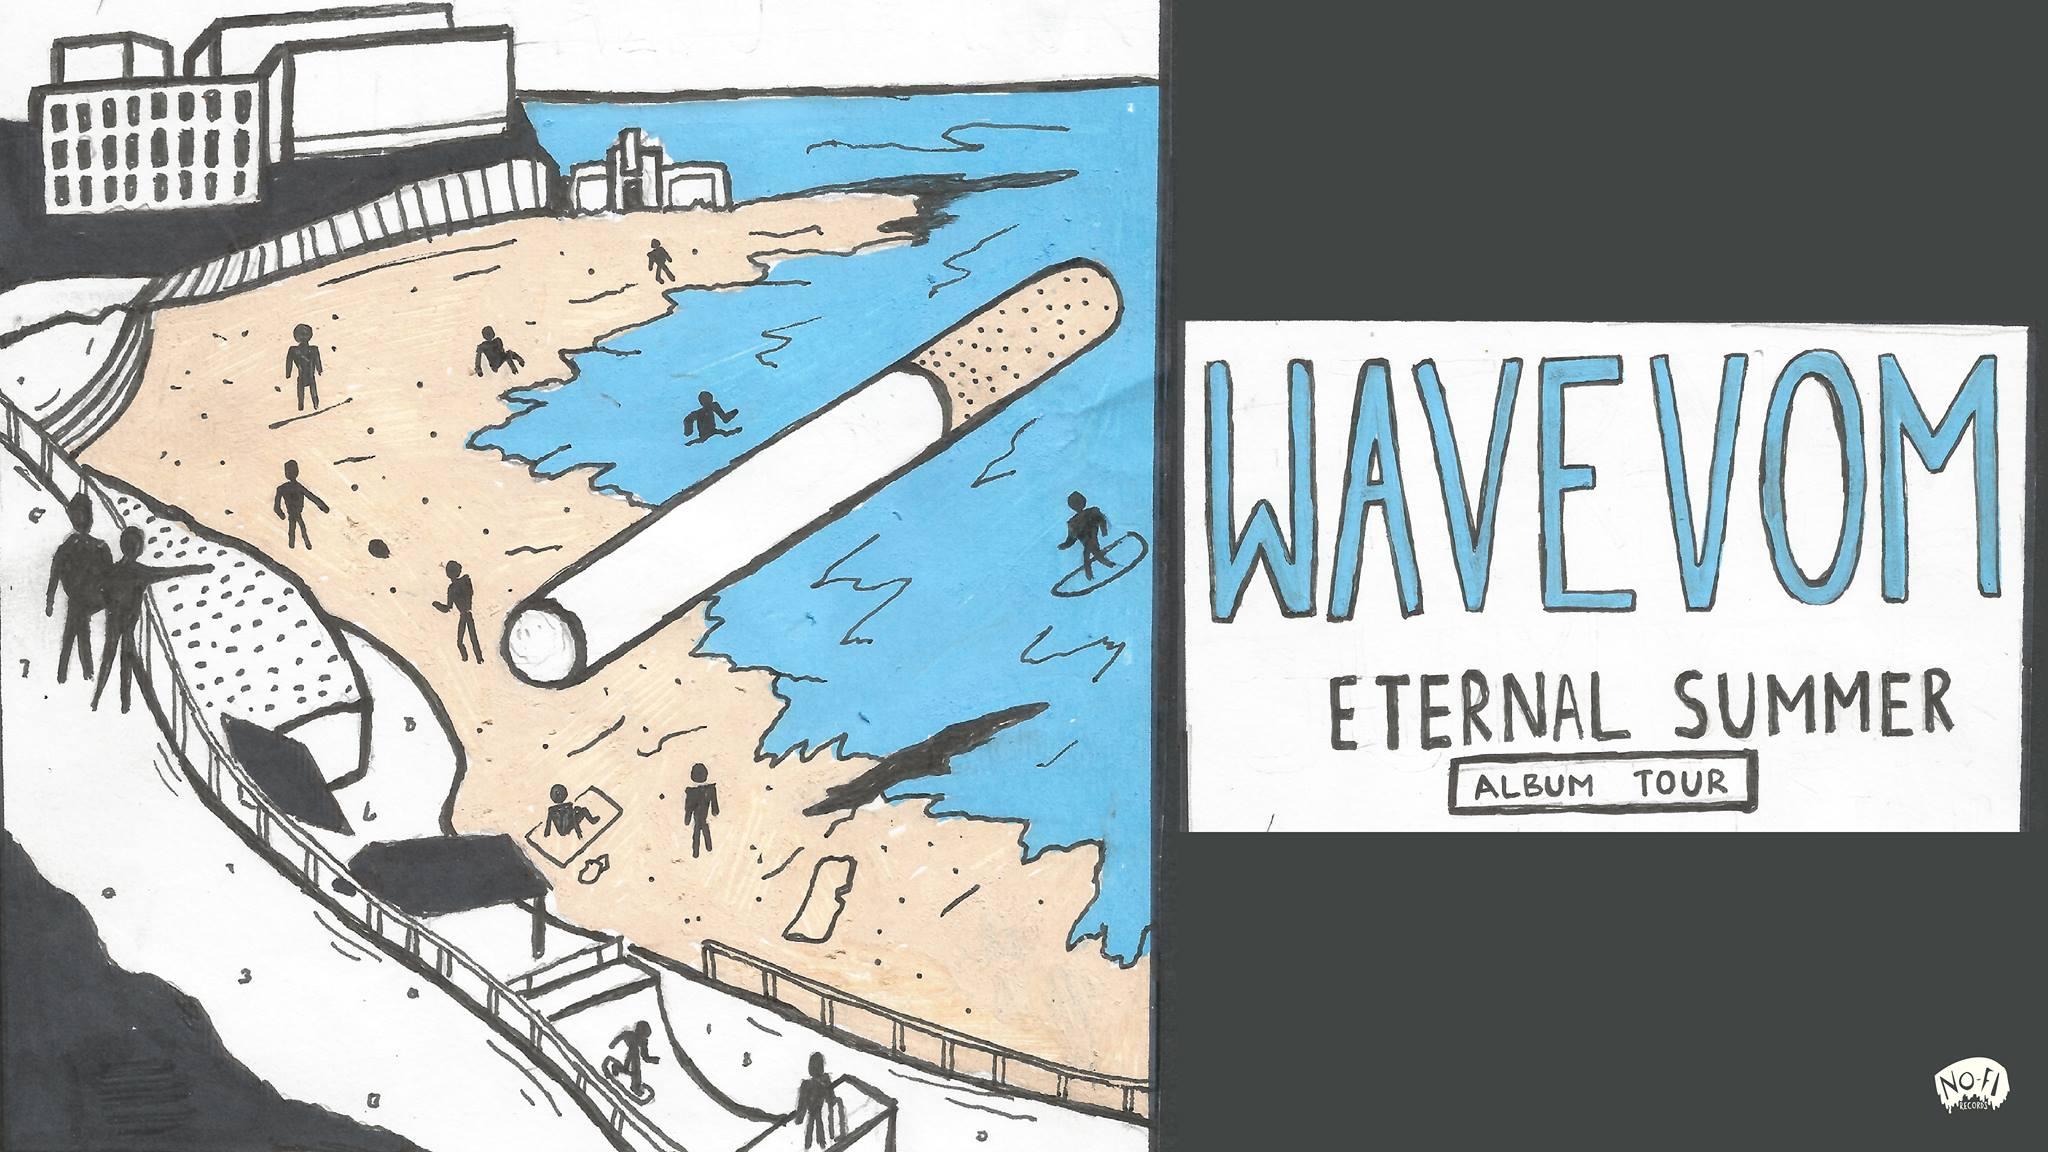 wavevom endless summer tour